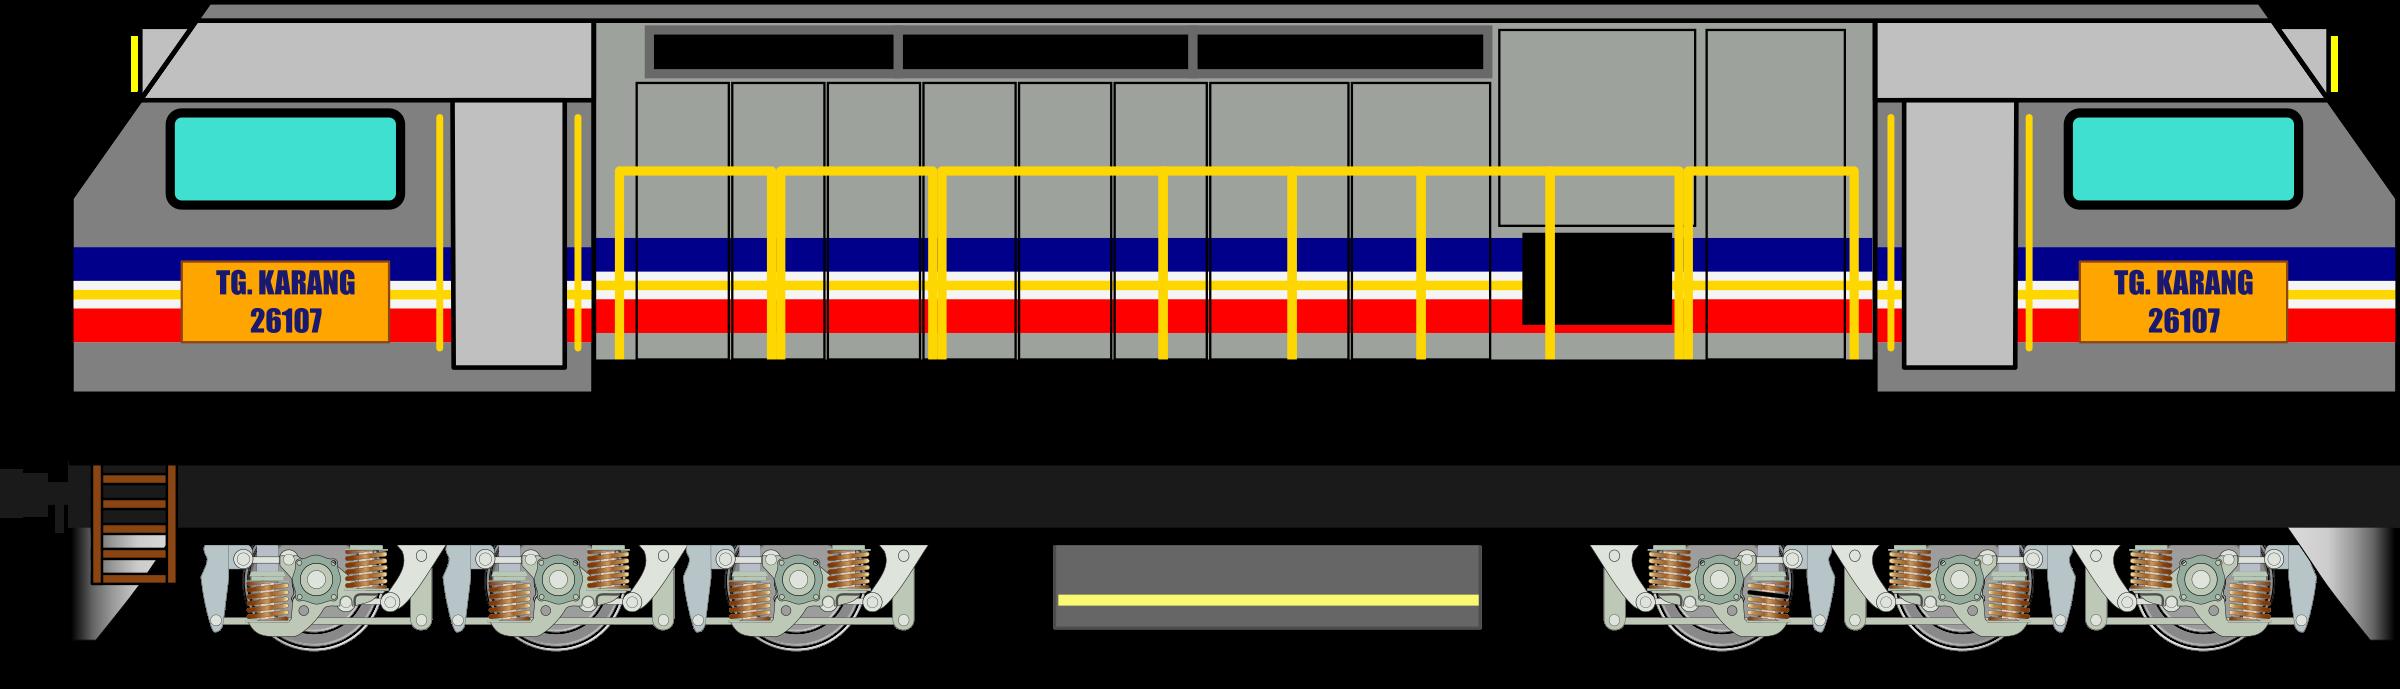 Clipart - KTM Class 26 Locomotive